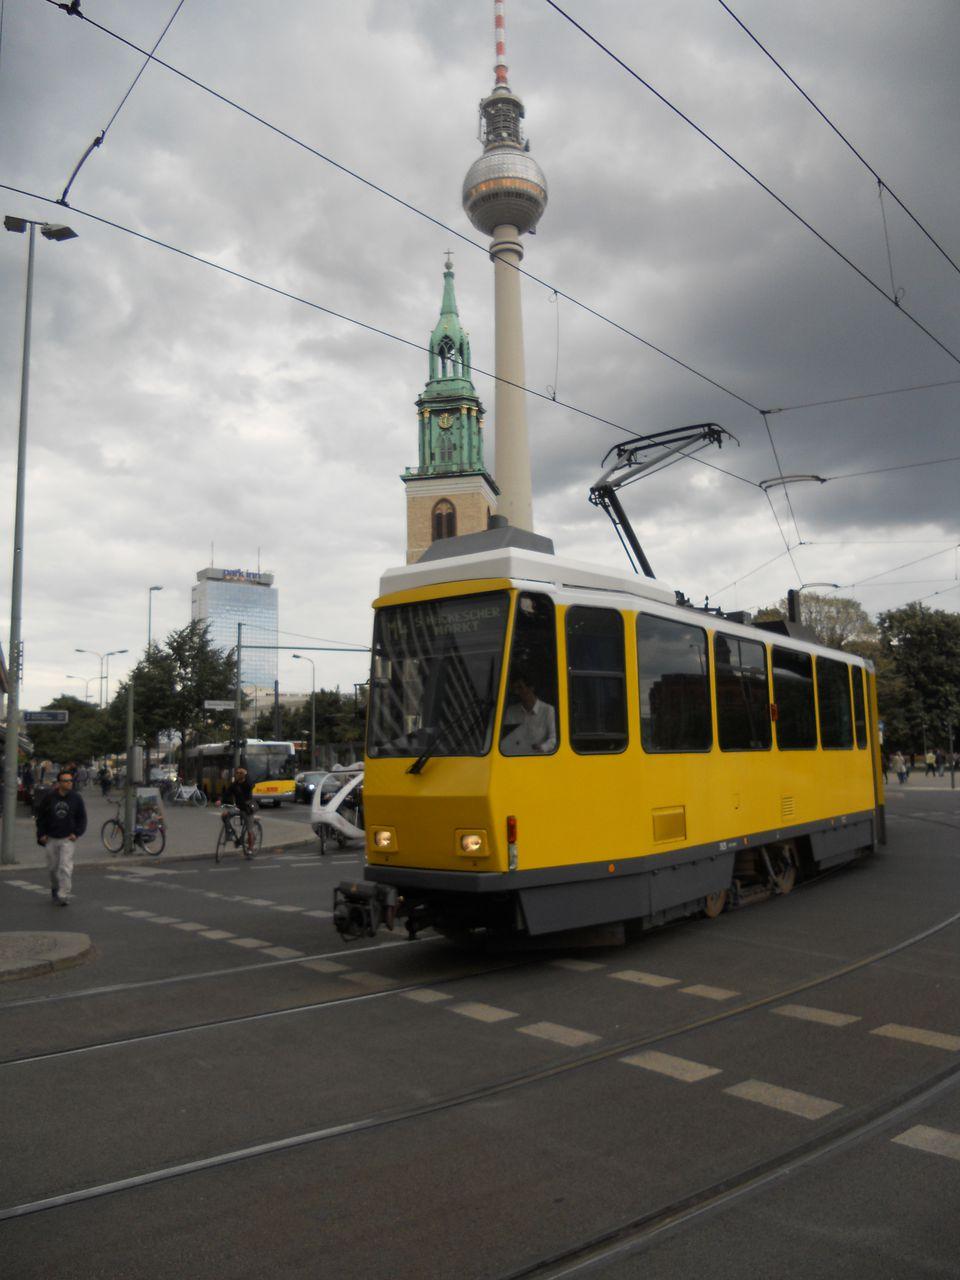 Berlin Fernsehturm and tram.JPG